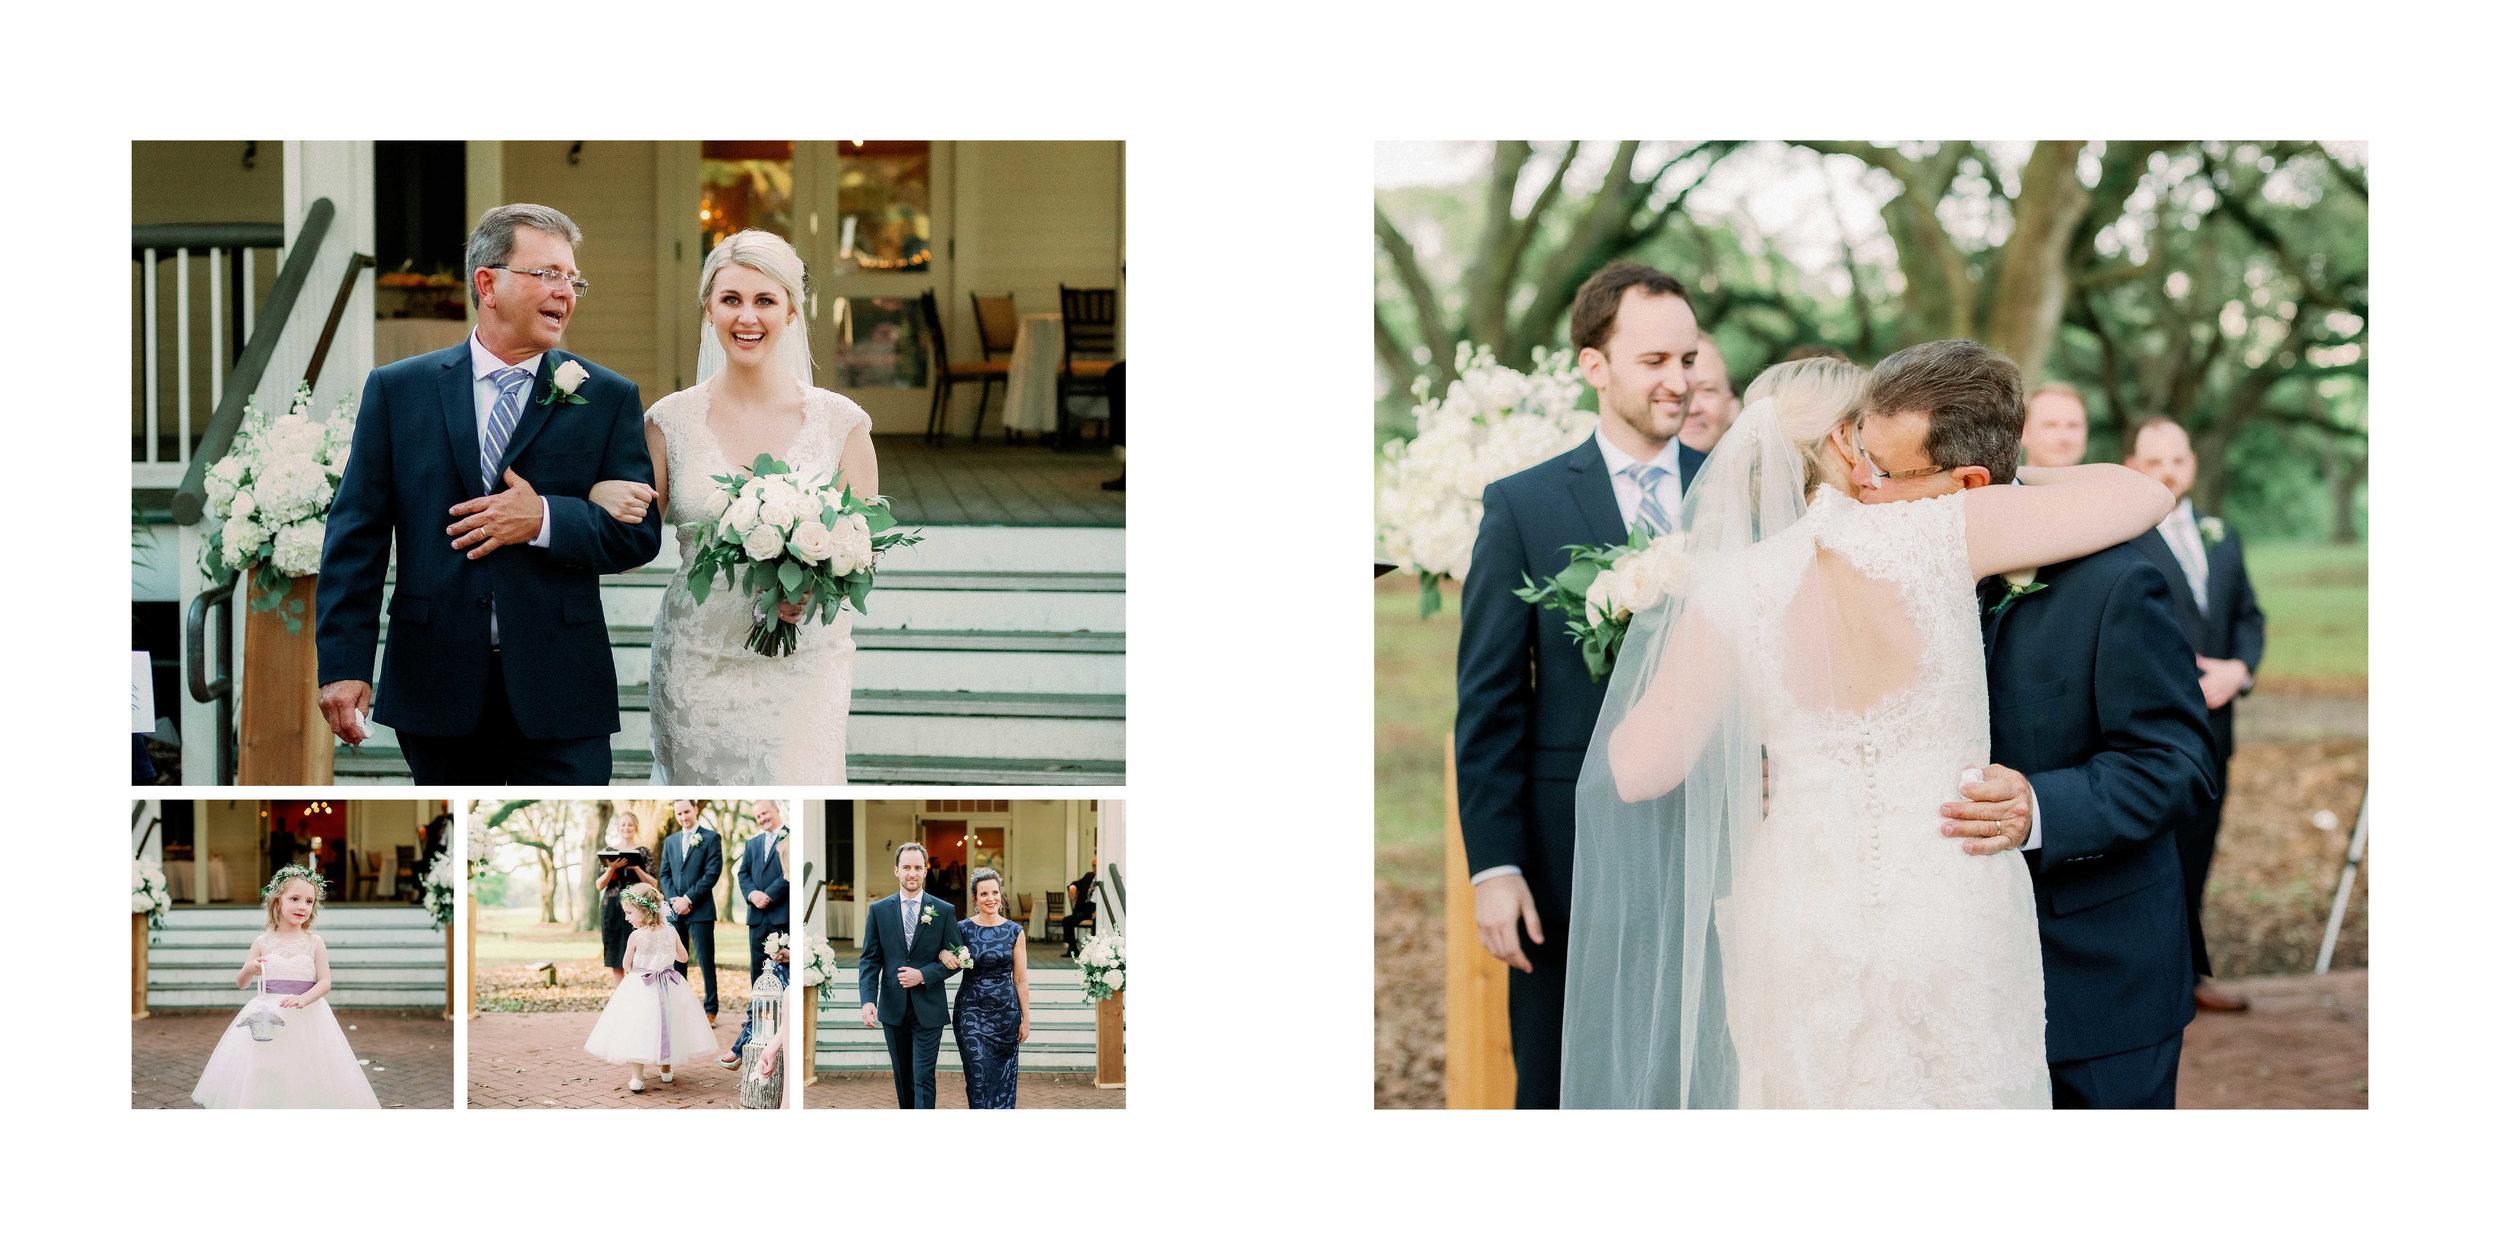 Audubon_Clubhouse_Wedding_Photographer (11).jpg